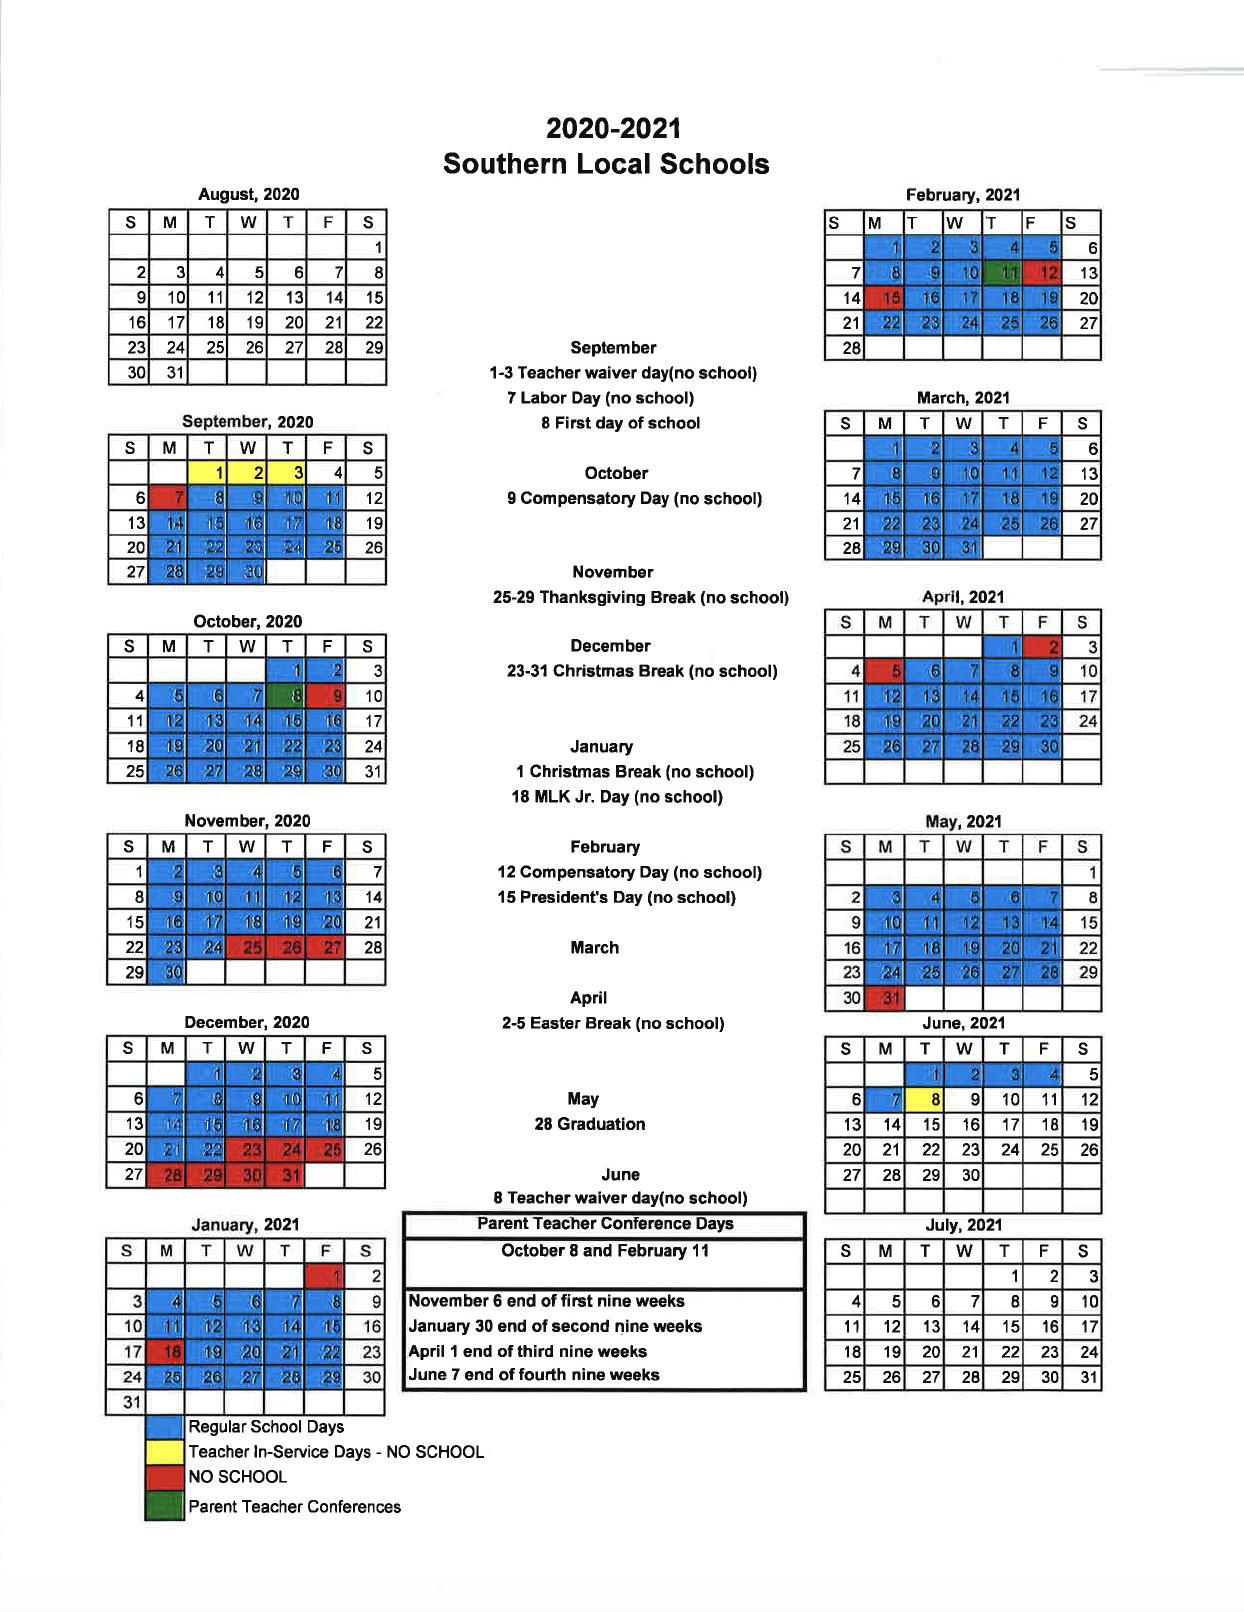 Revised 2020-21 School Year Calendar